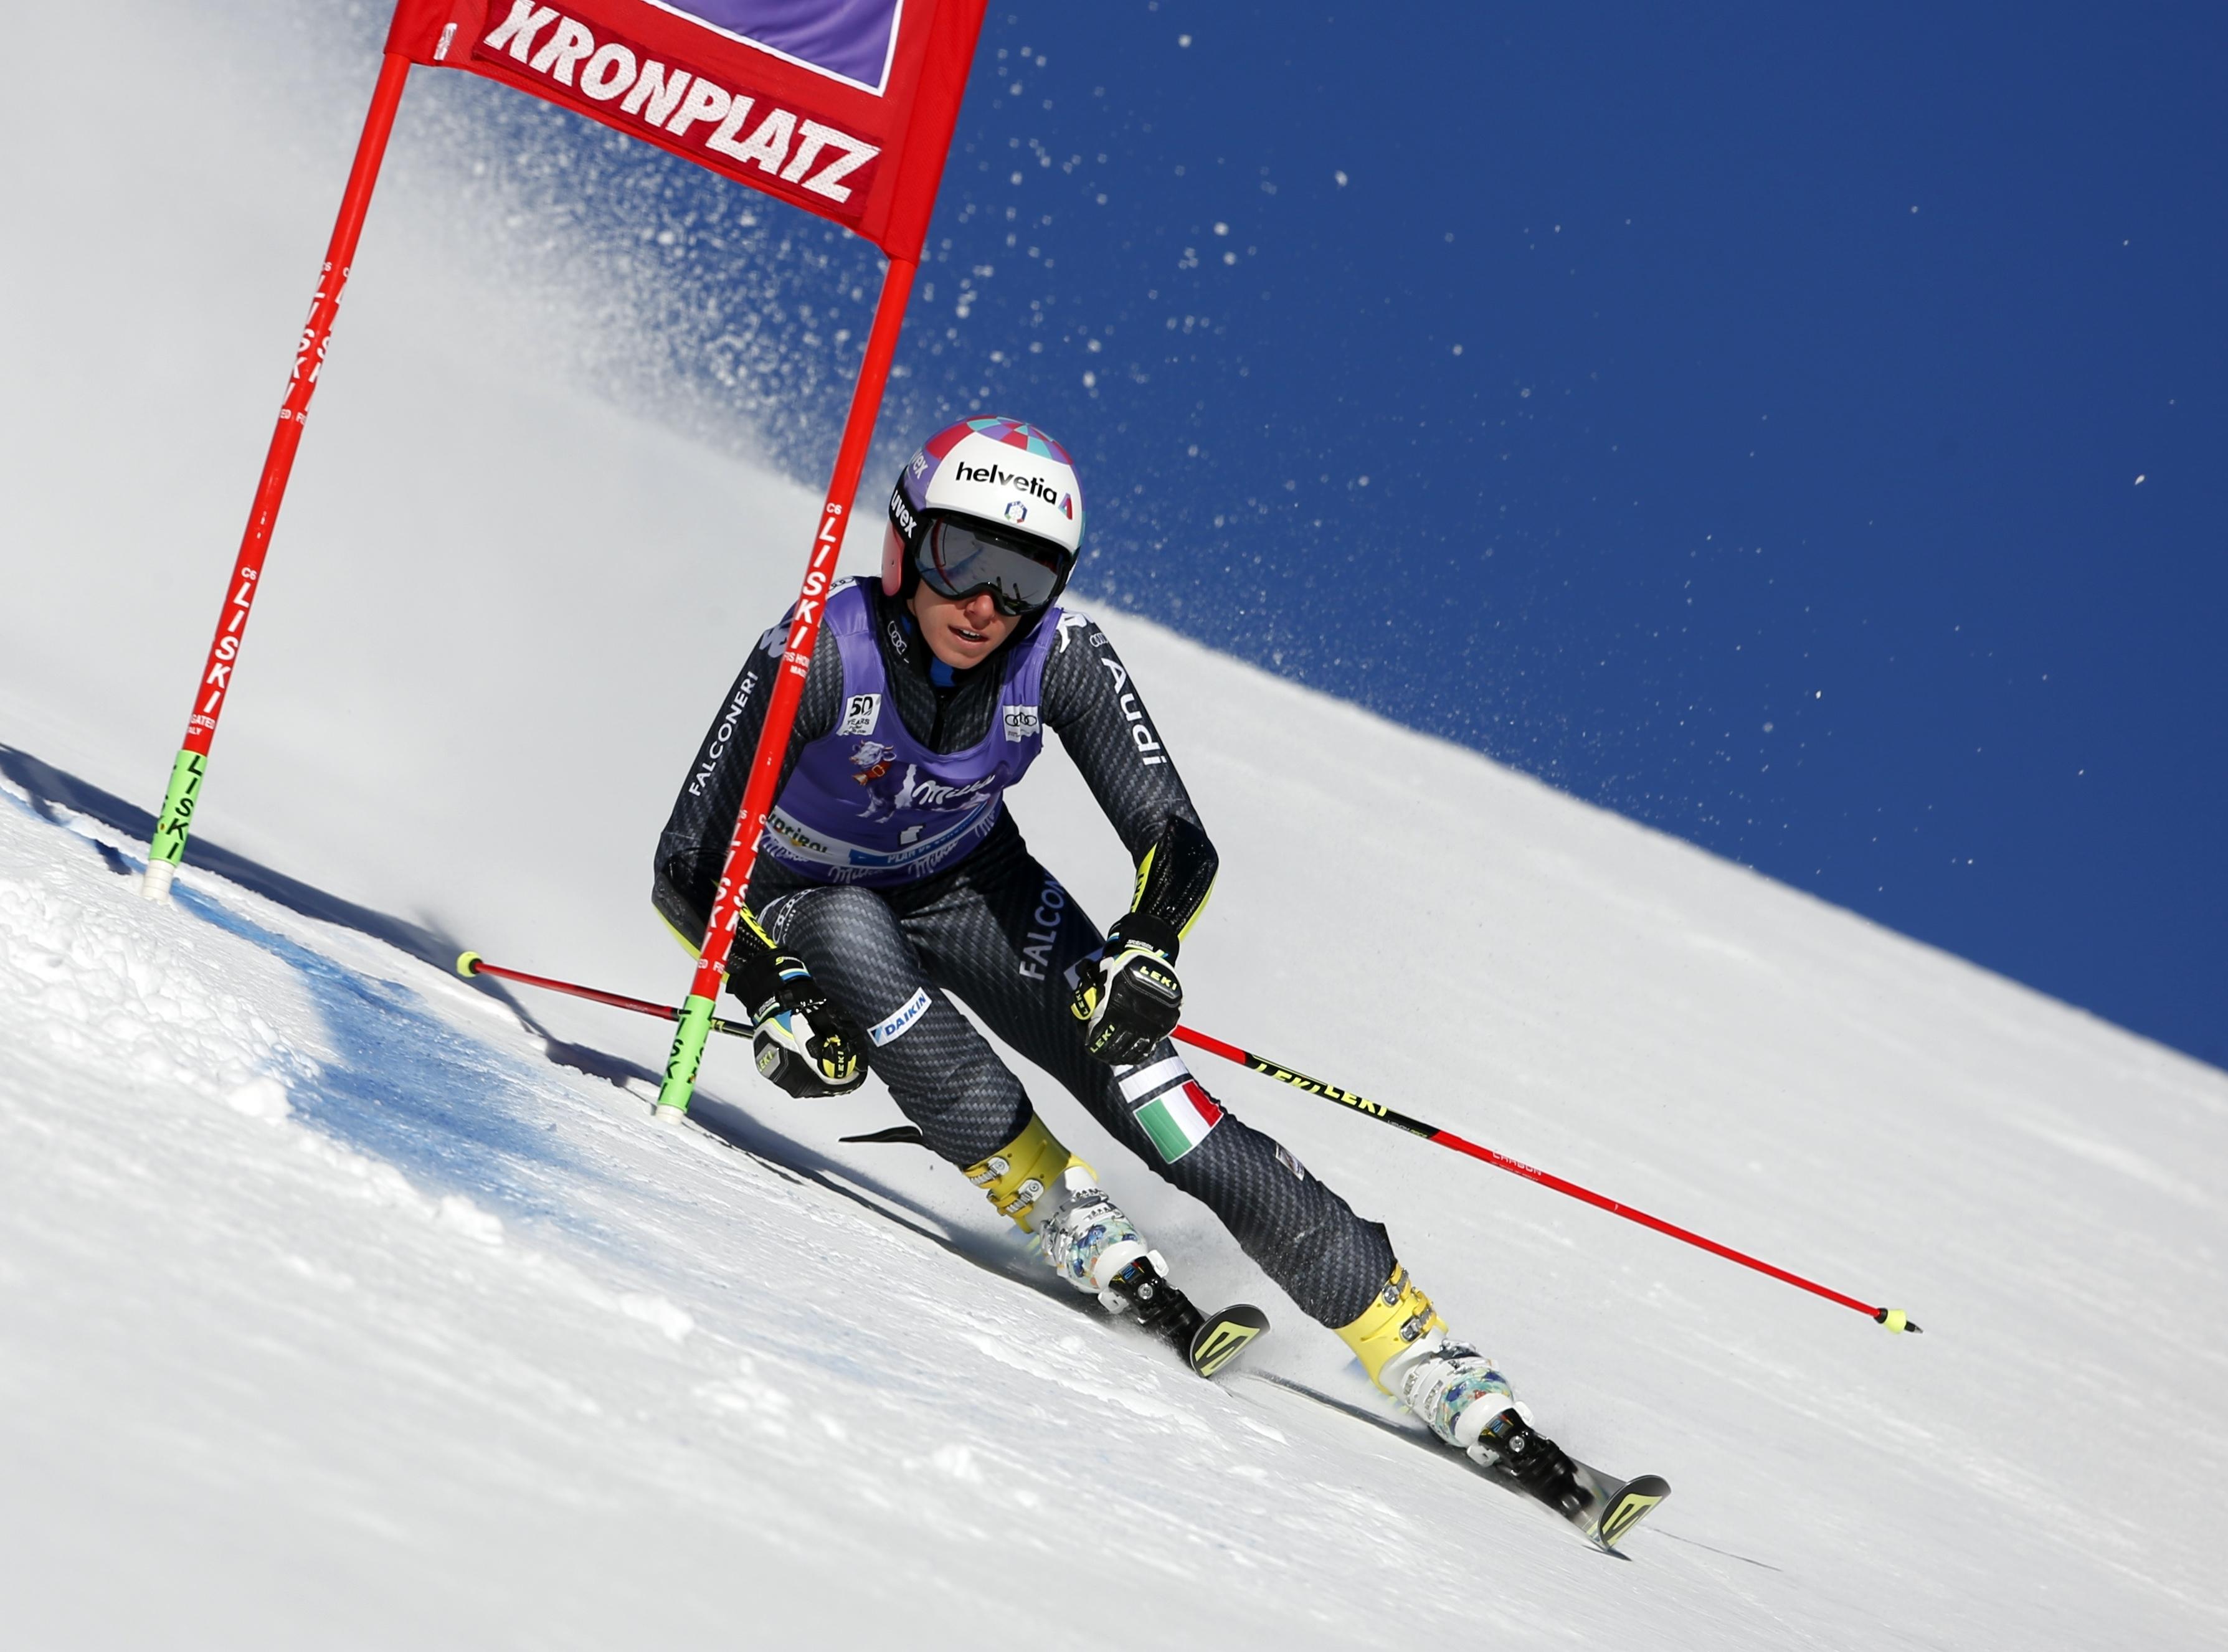 Italy's Marta Bassino speeds down the course during an alpine ski, women's World Cup giant slalom, in San Vigilio di Marebbe, Italy, Tuesday, Jan. 24, 2017. (AP Photo/Marco Trovati)